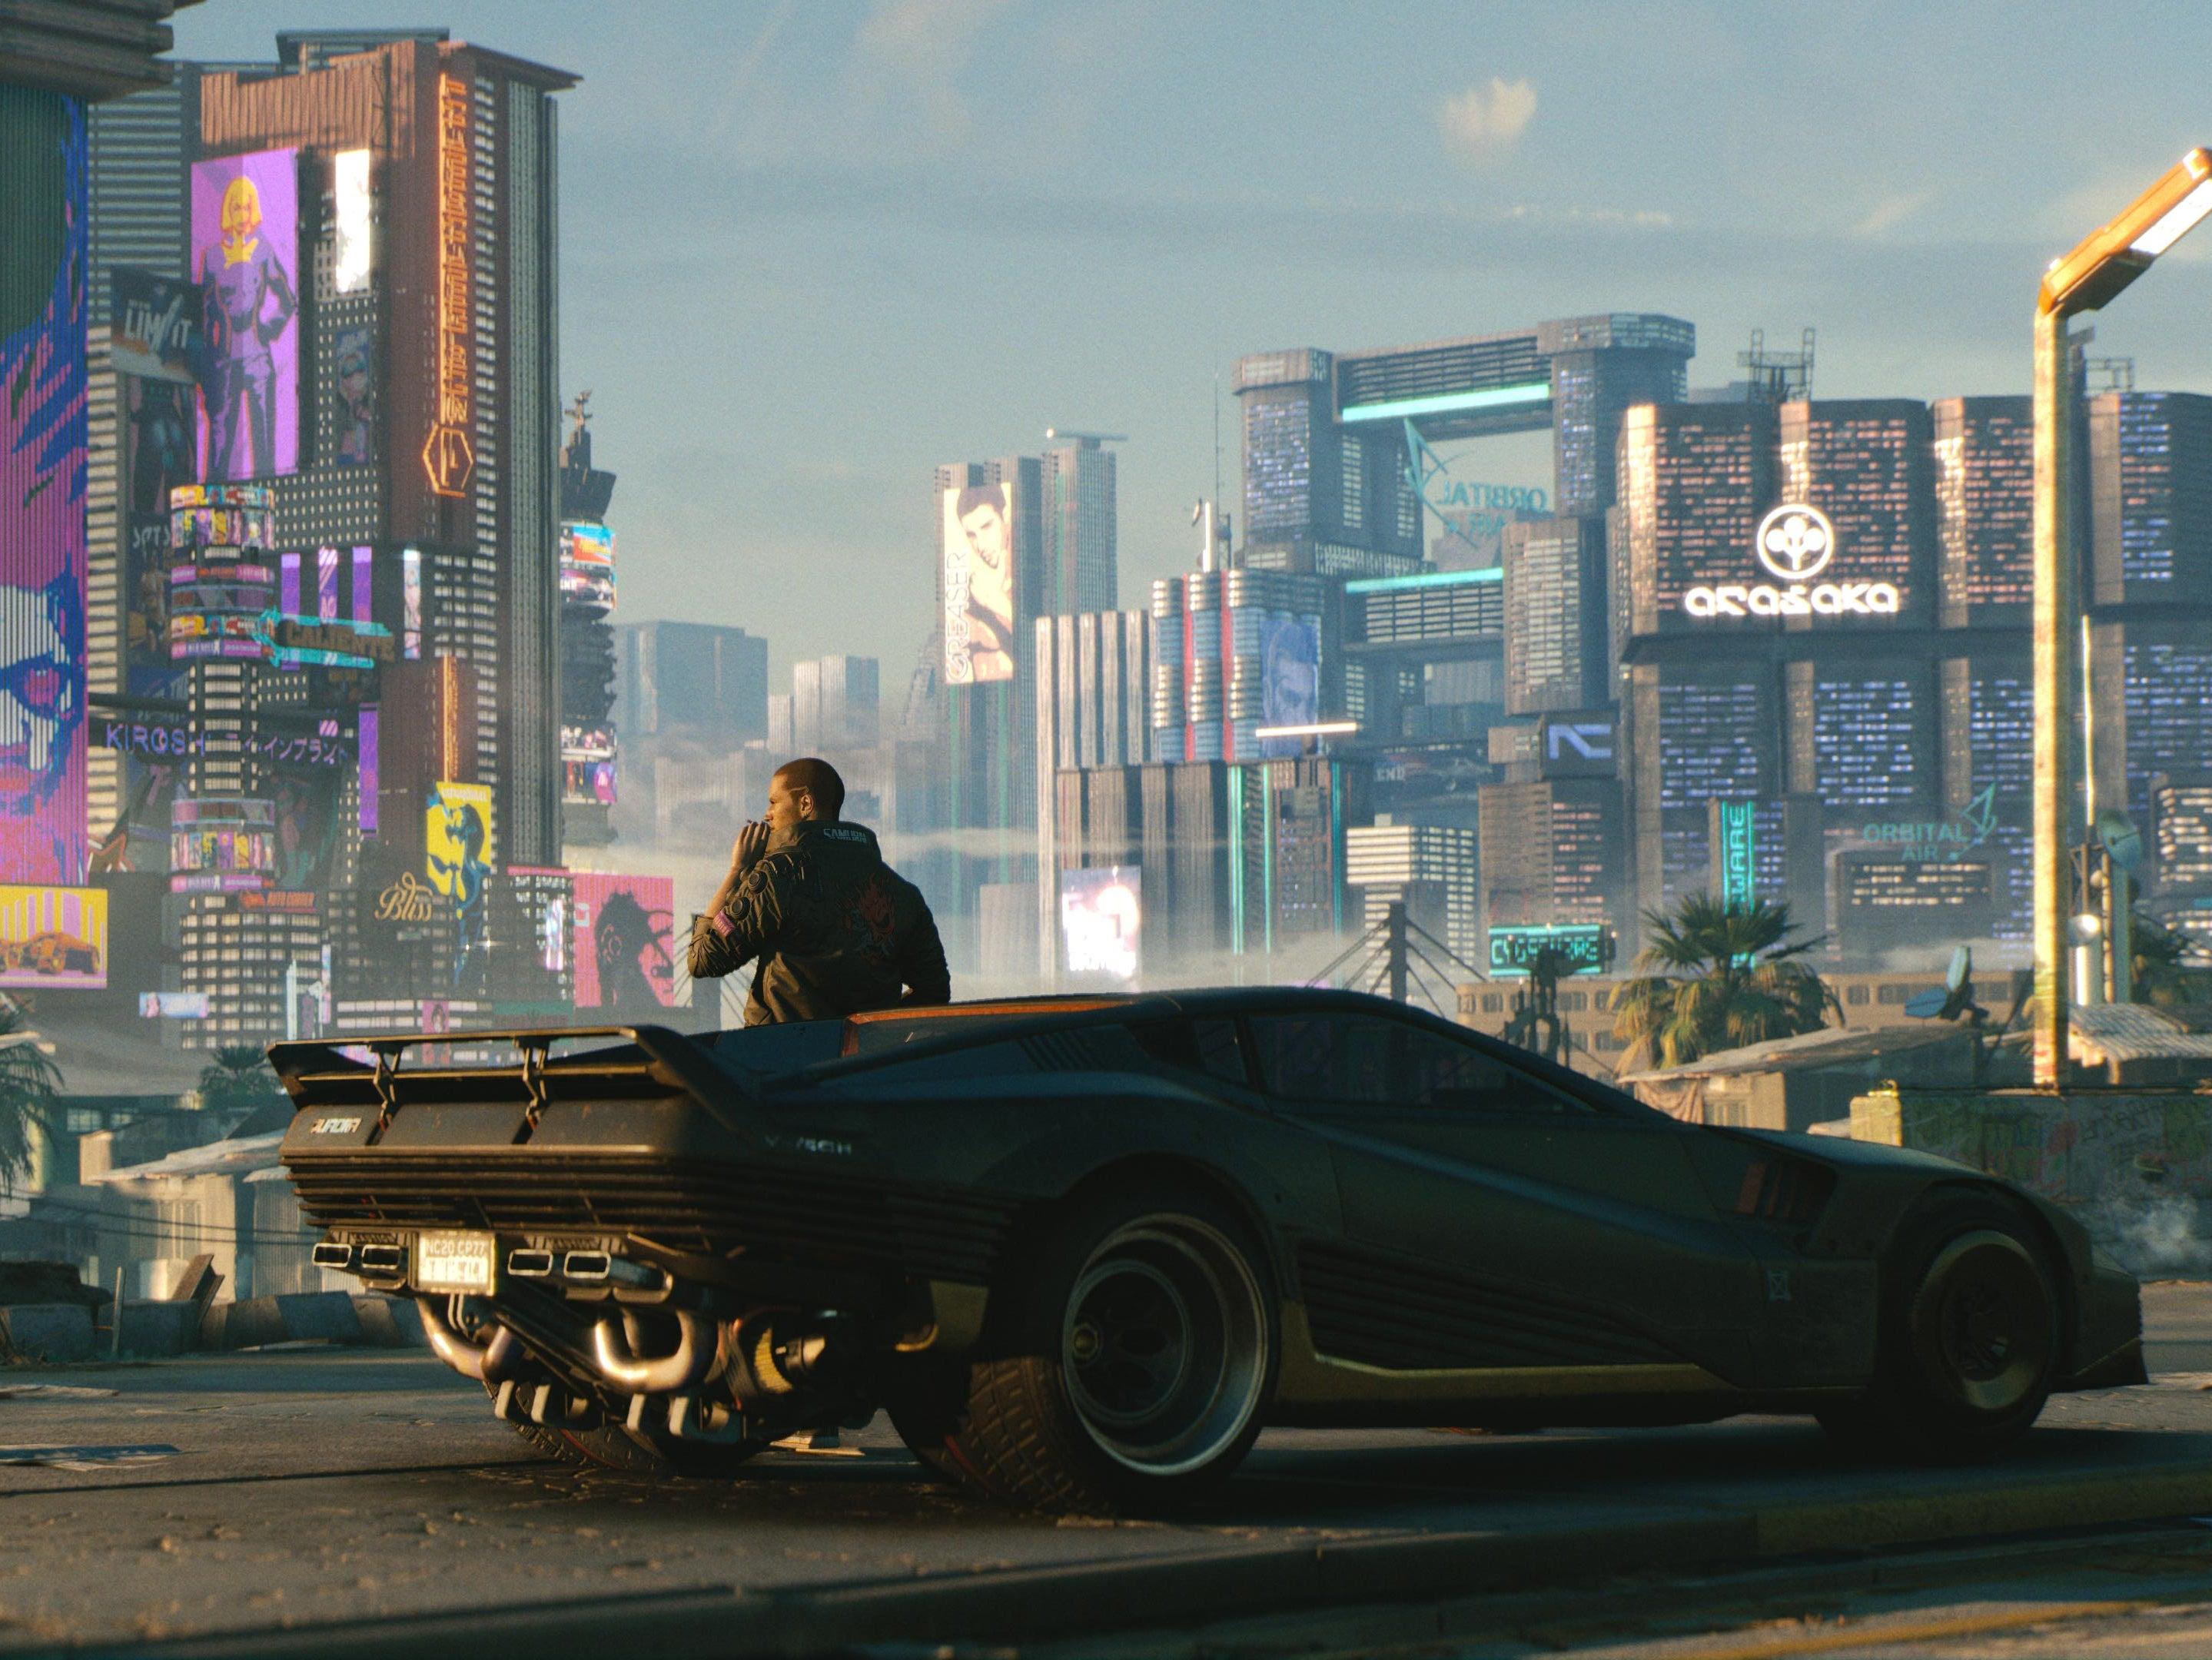 Cyberpunk 2077 delayed again until 10 December